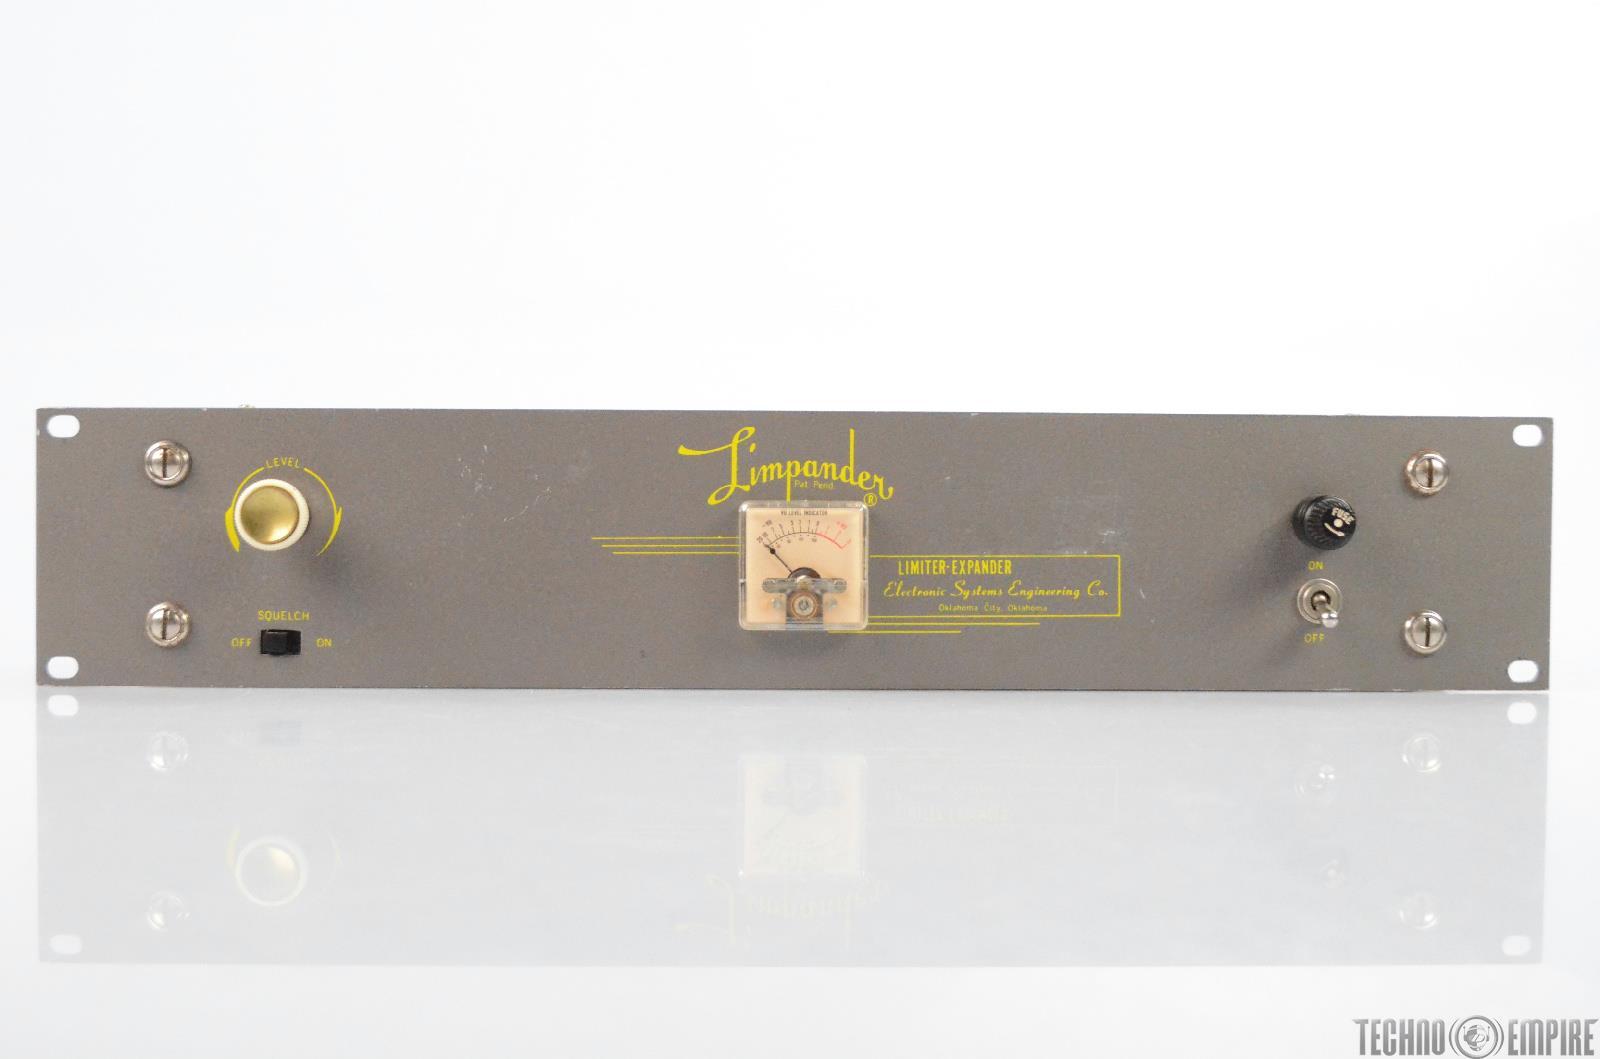 Limpander LE 3 Vacuum Tube Limiter Expander Rack Compressor Rare #31011